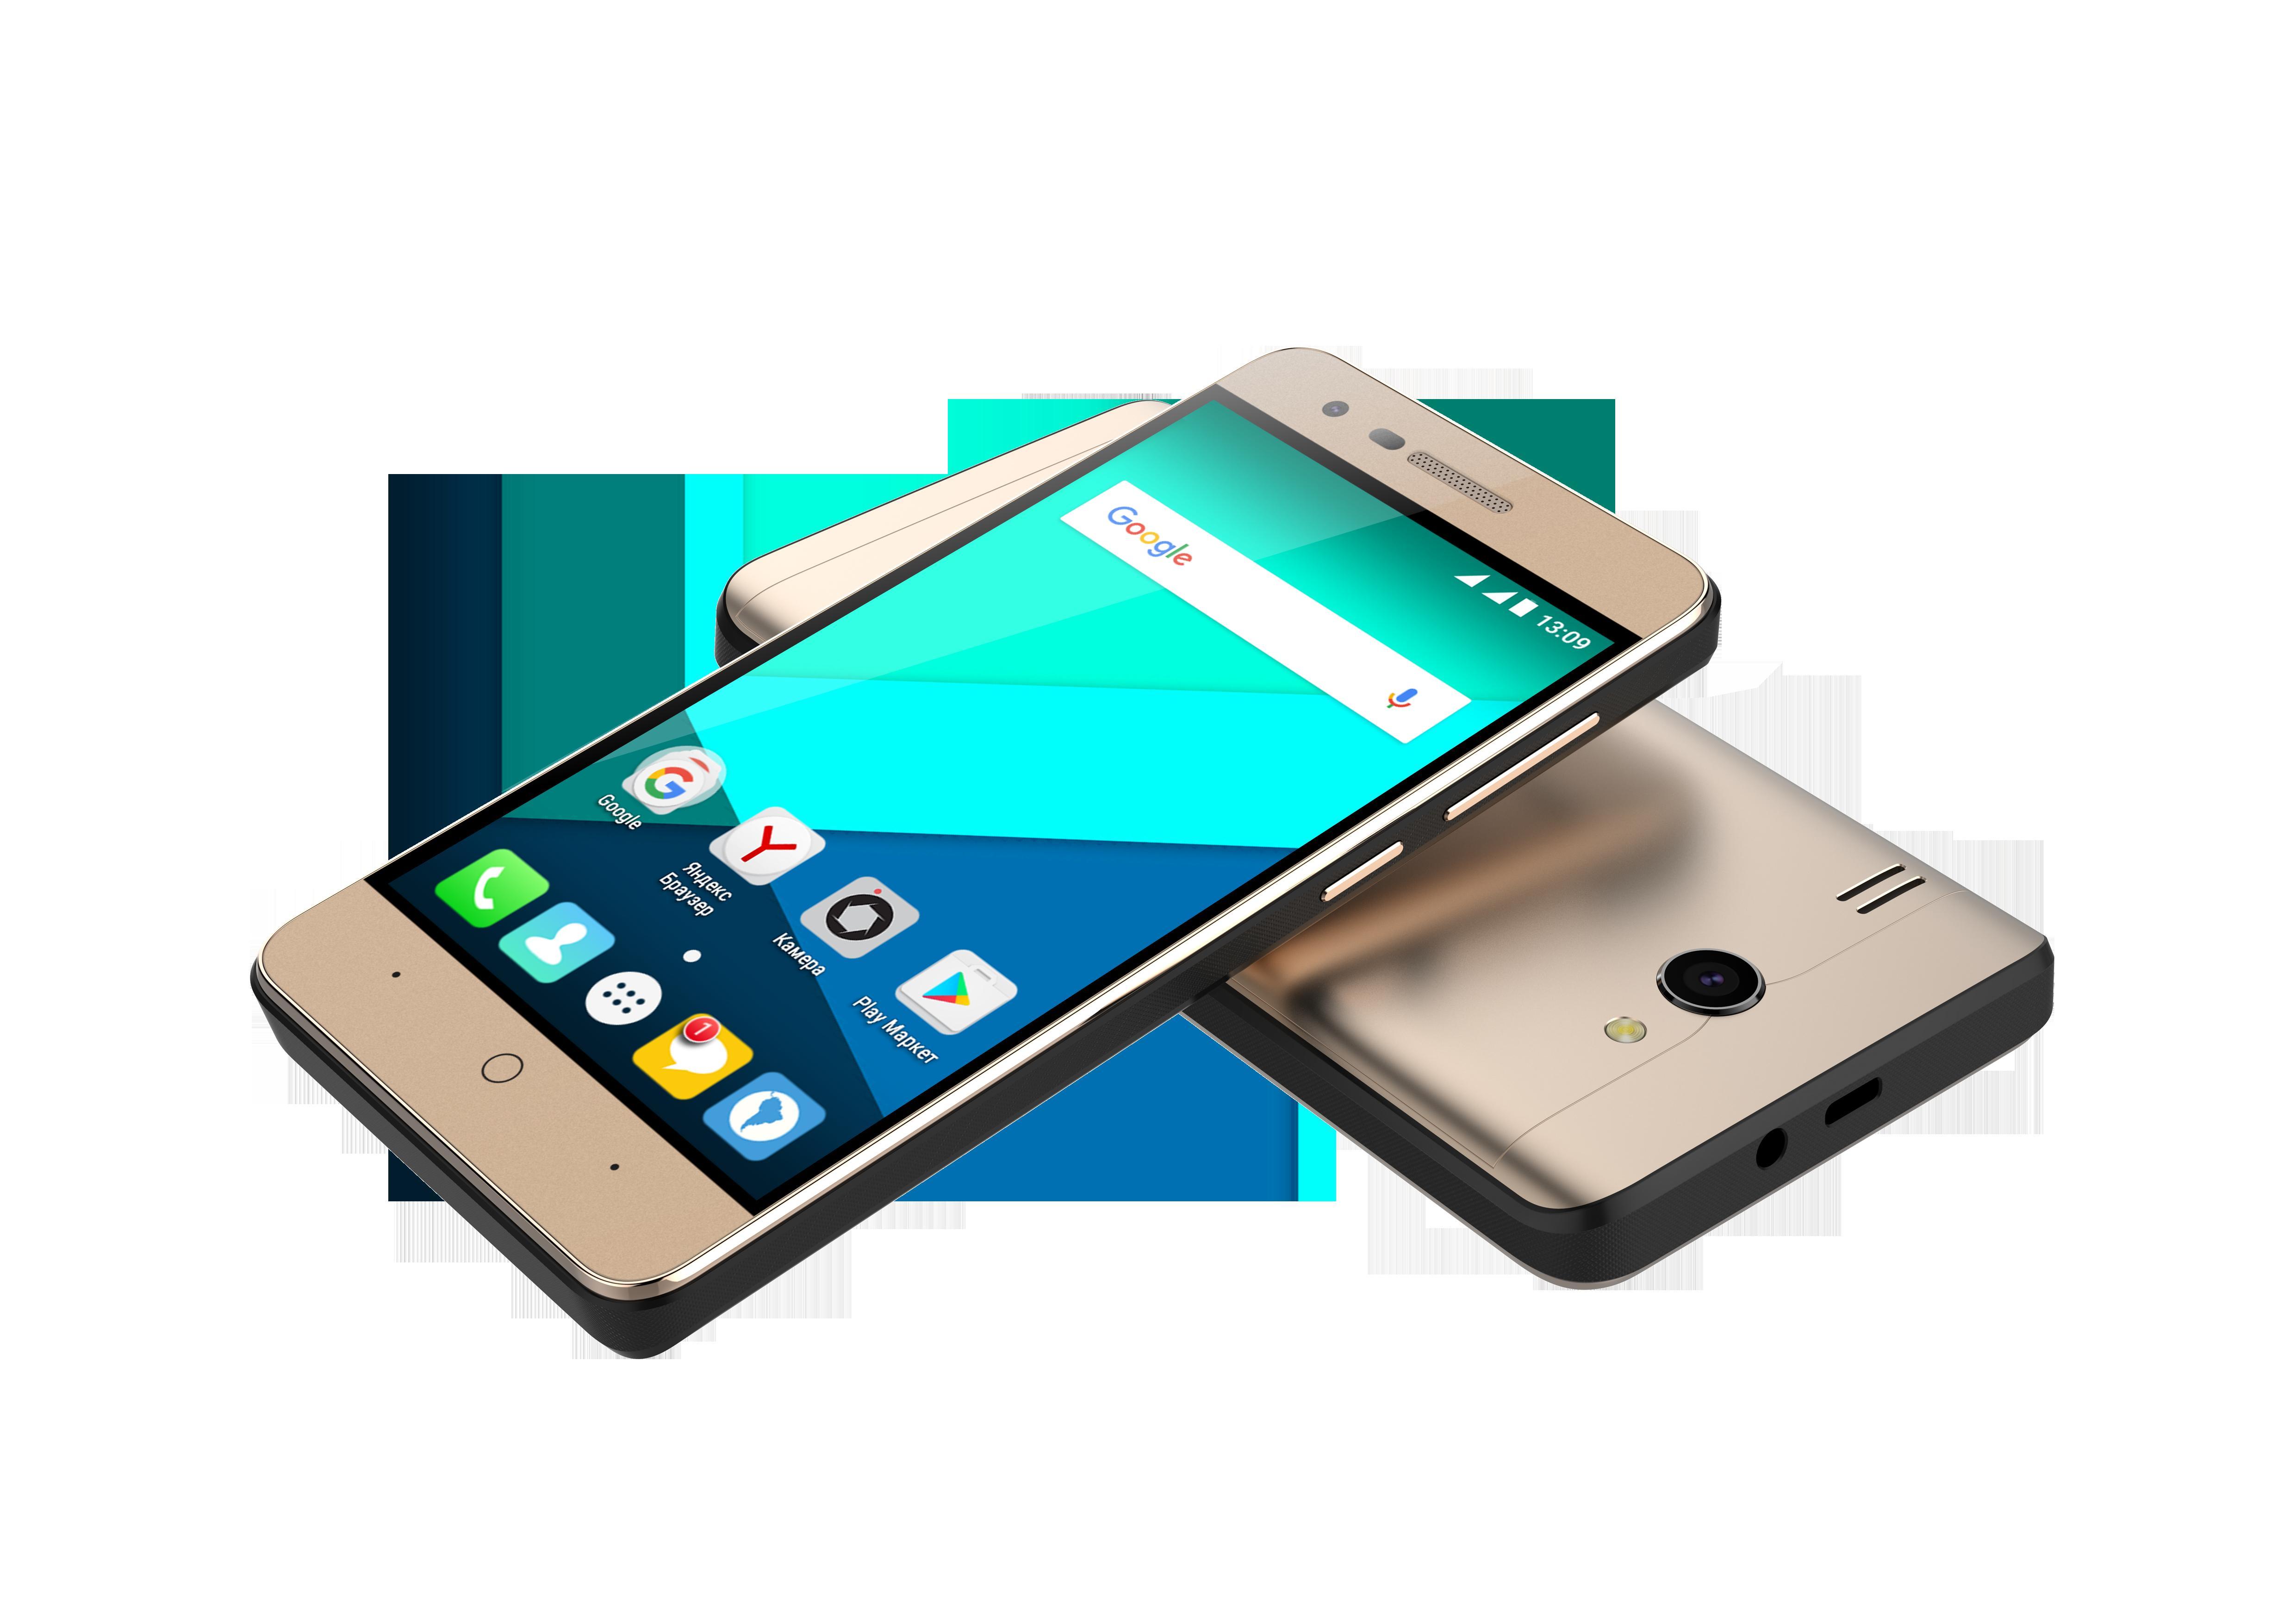 Micromax Q3551 Bolt juice: неплохой смартфон за свои деньги